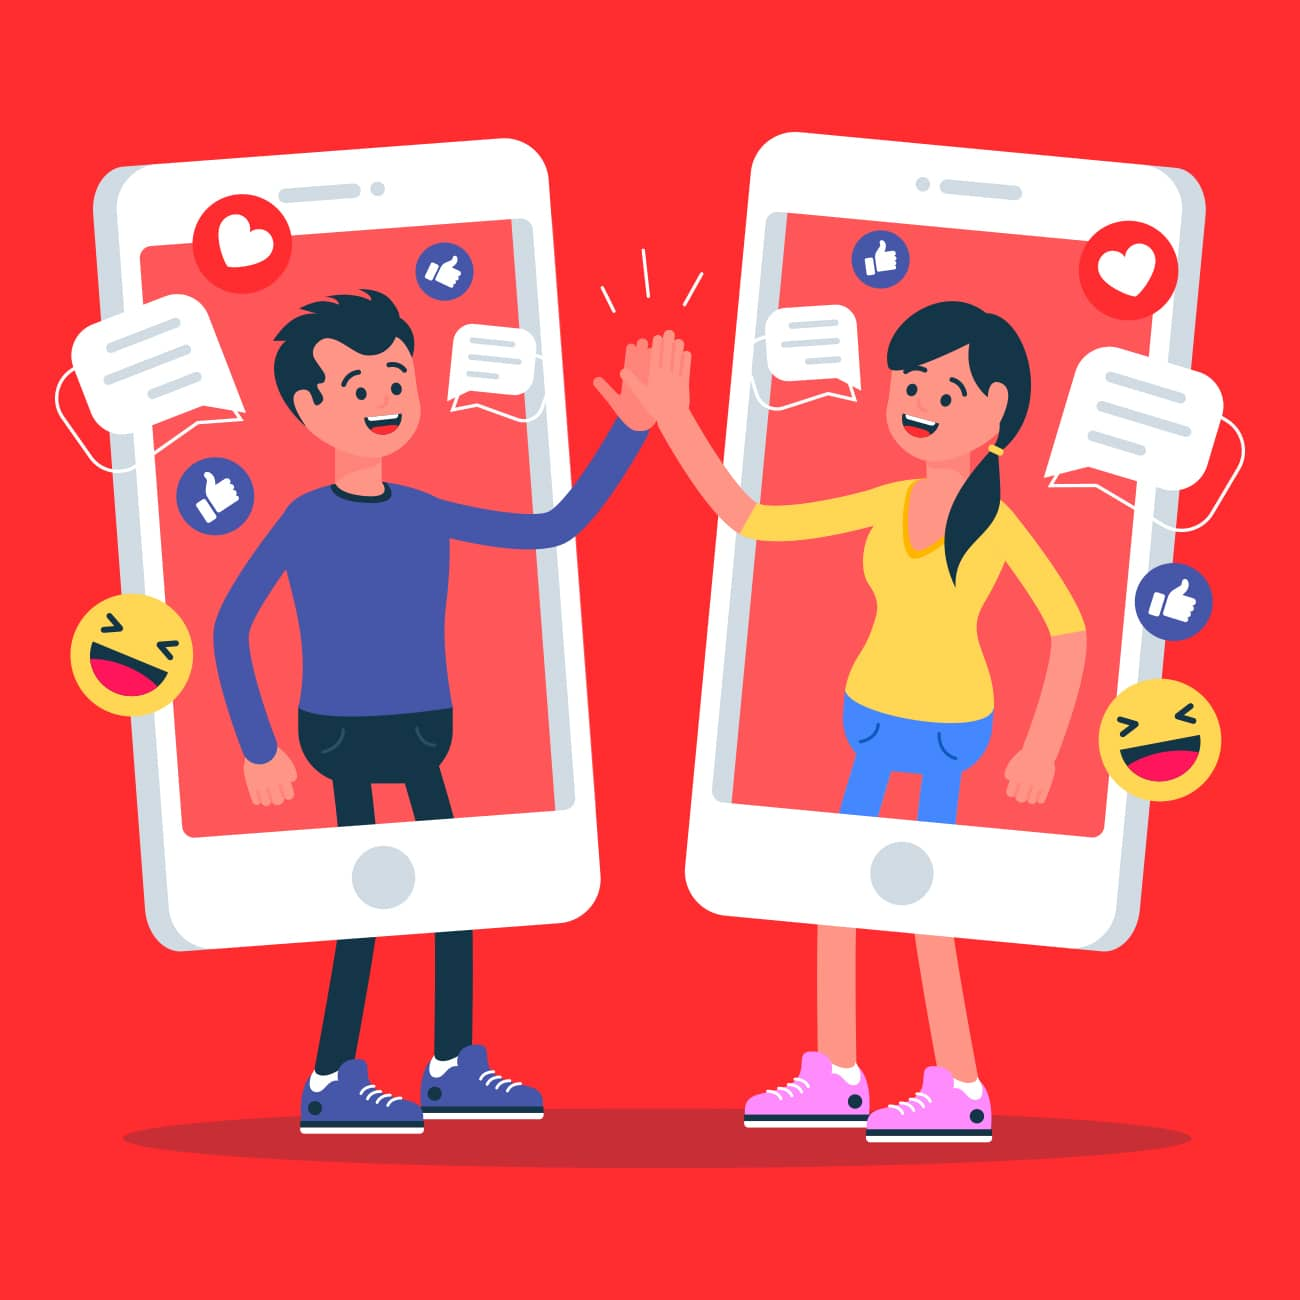 Creation reseaux sociaux facebook instagram a avignon